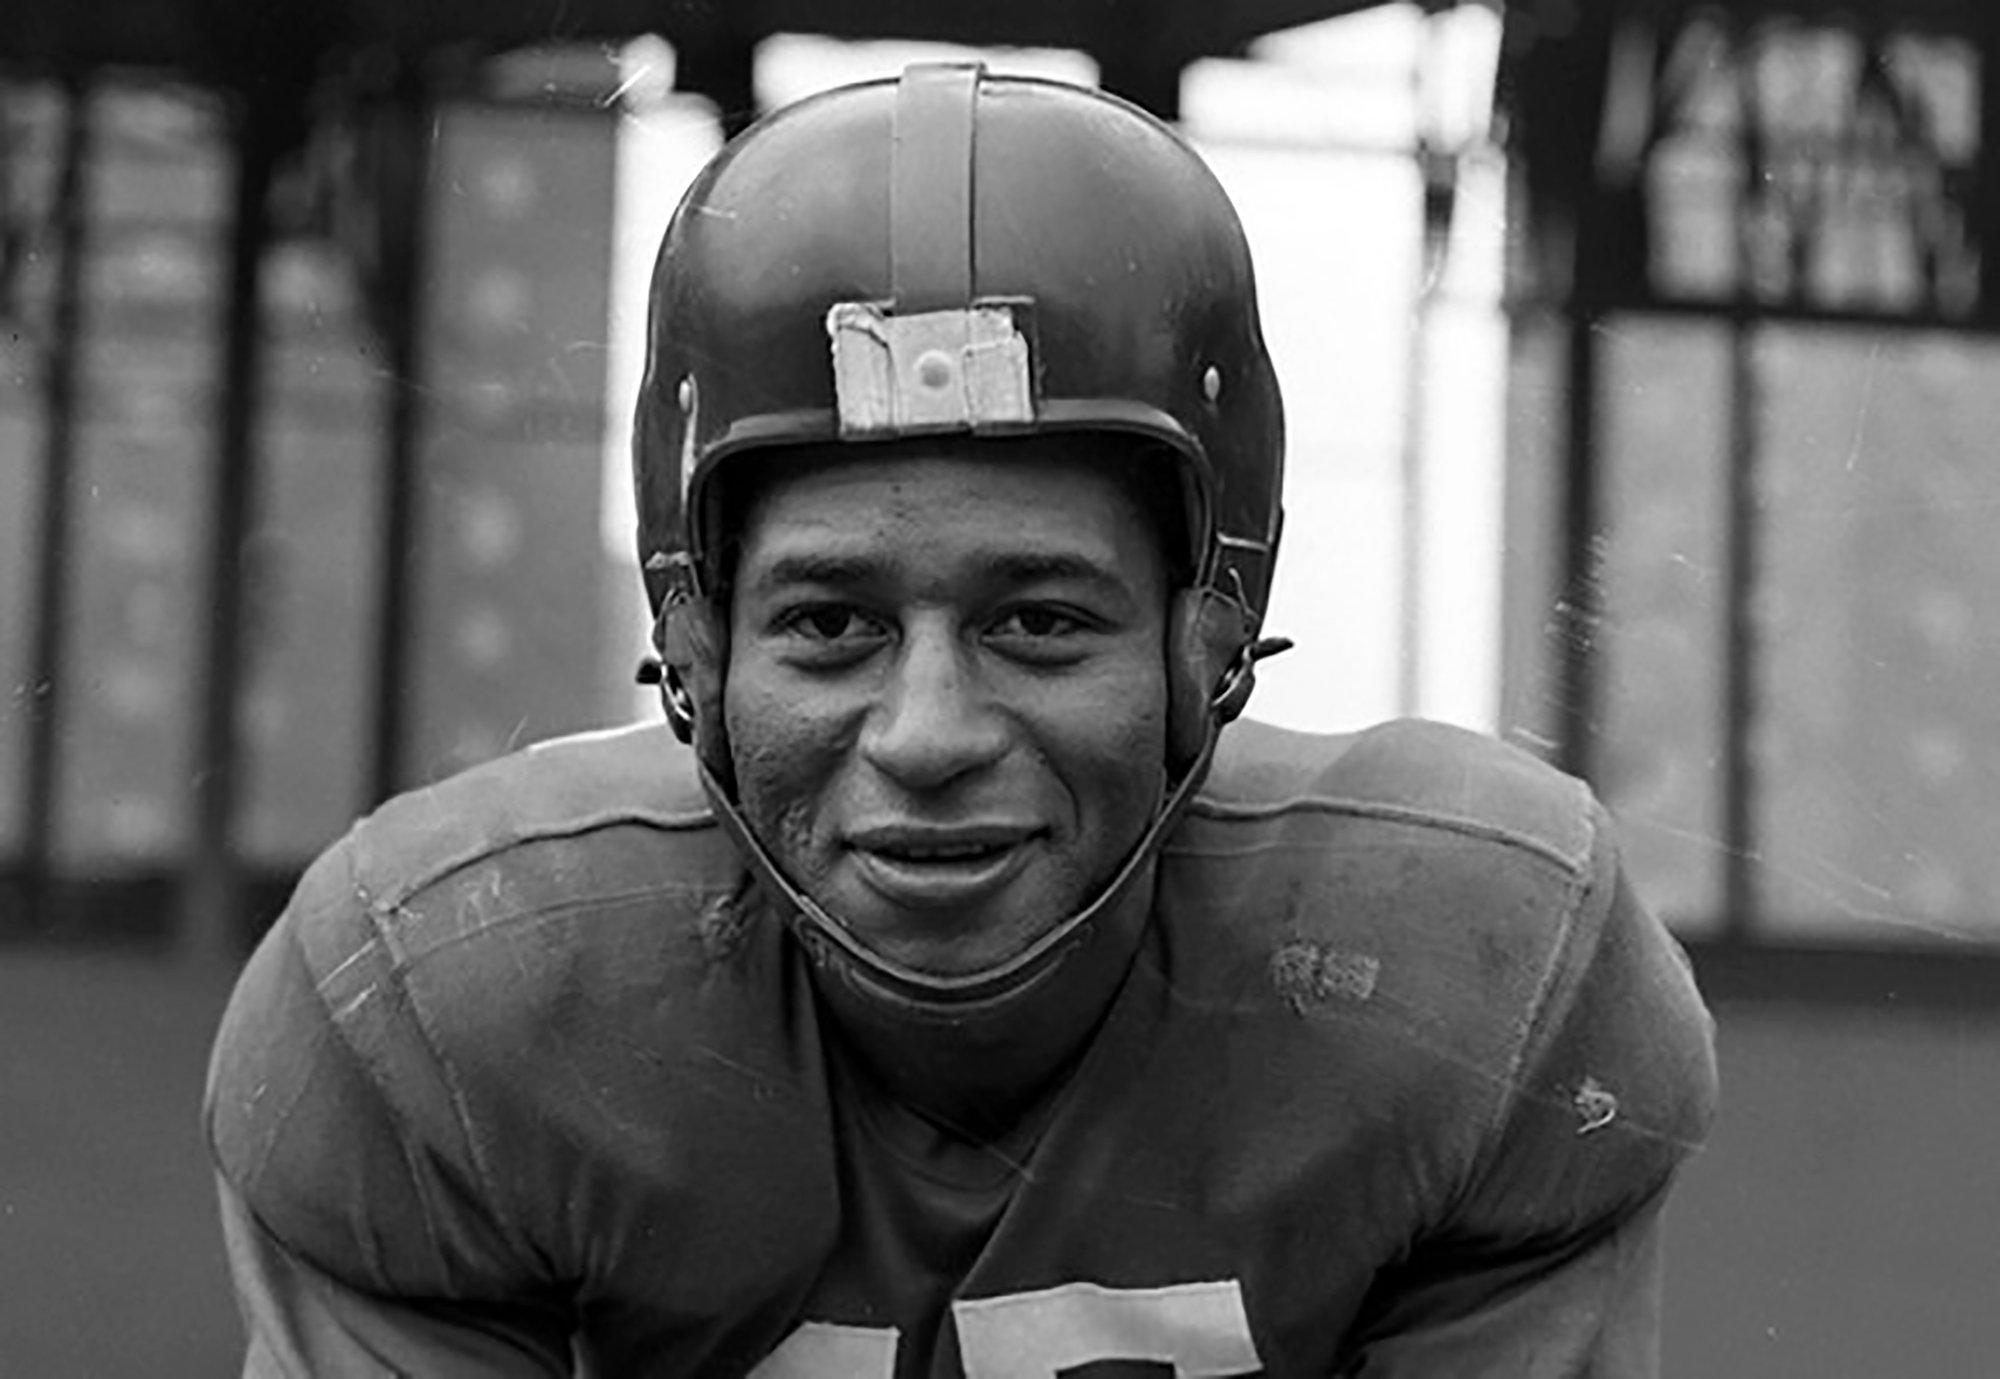 Coast Guard honors Black veteran, NFL great Emlen Tunnell